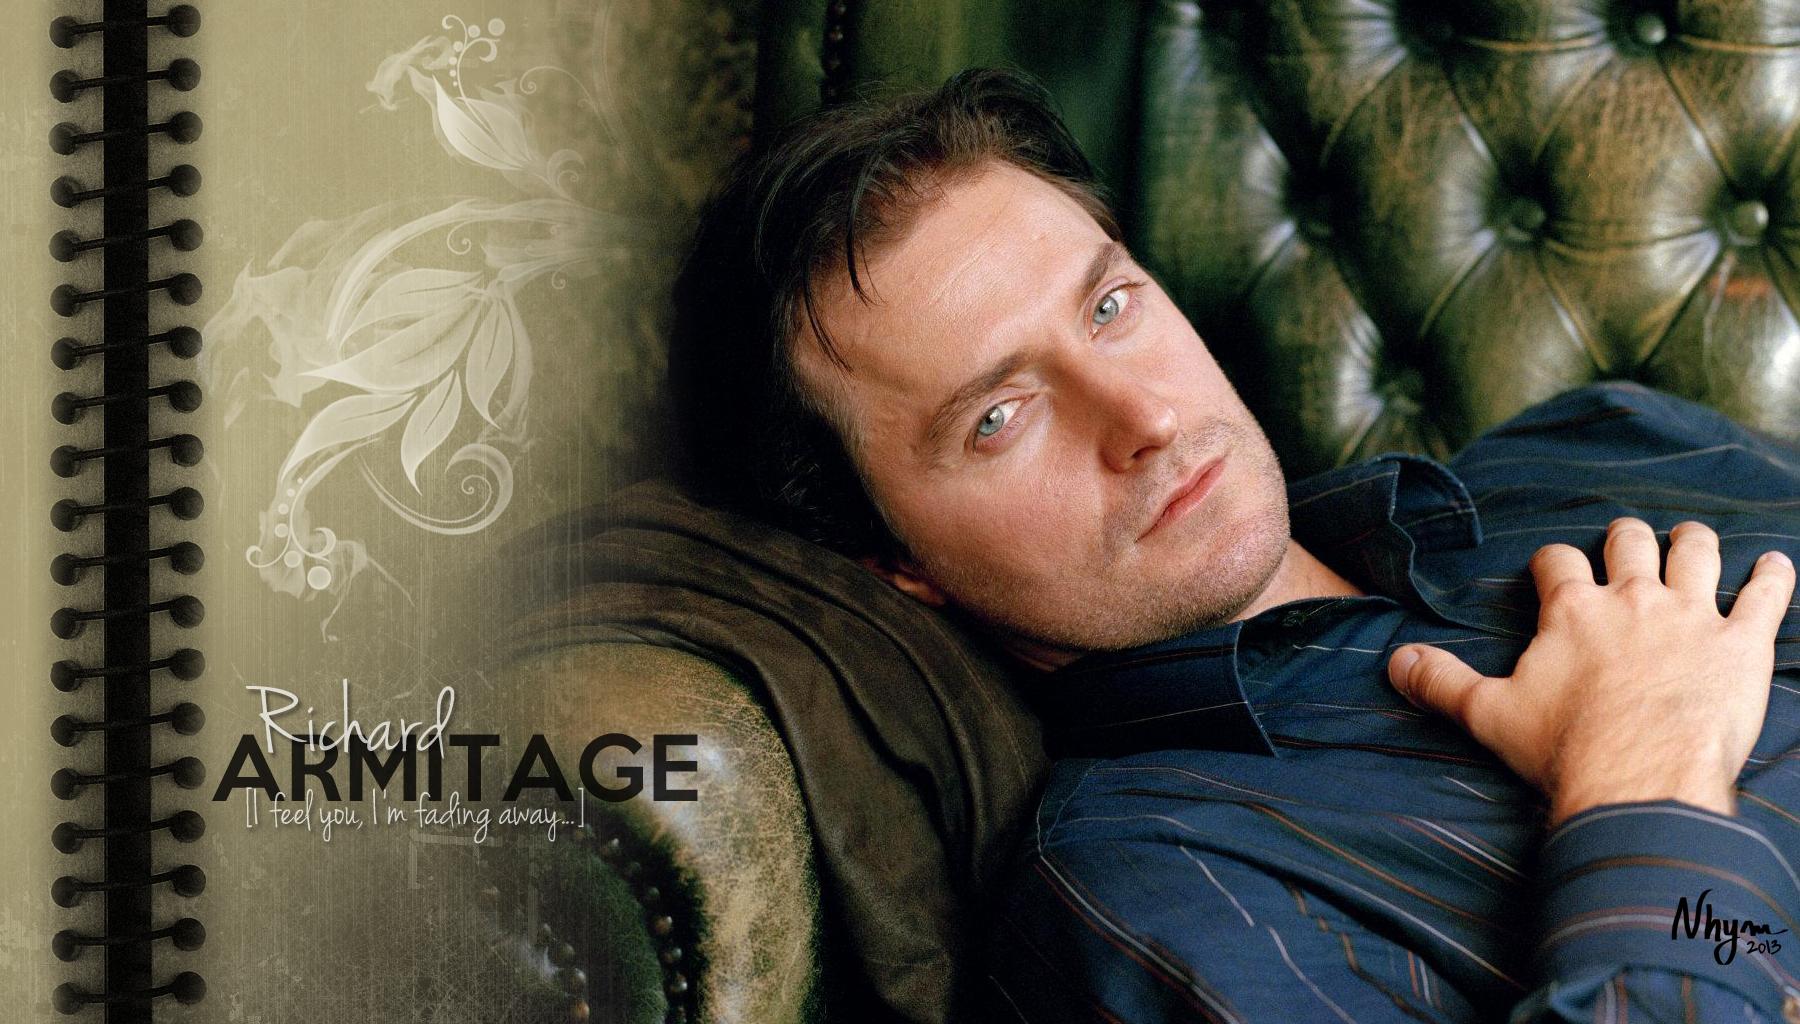 Richard Armitage Wallpaper